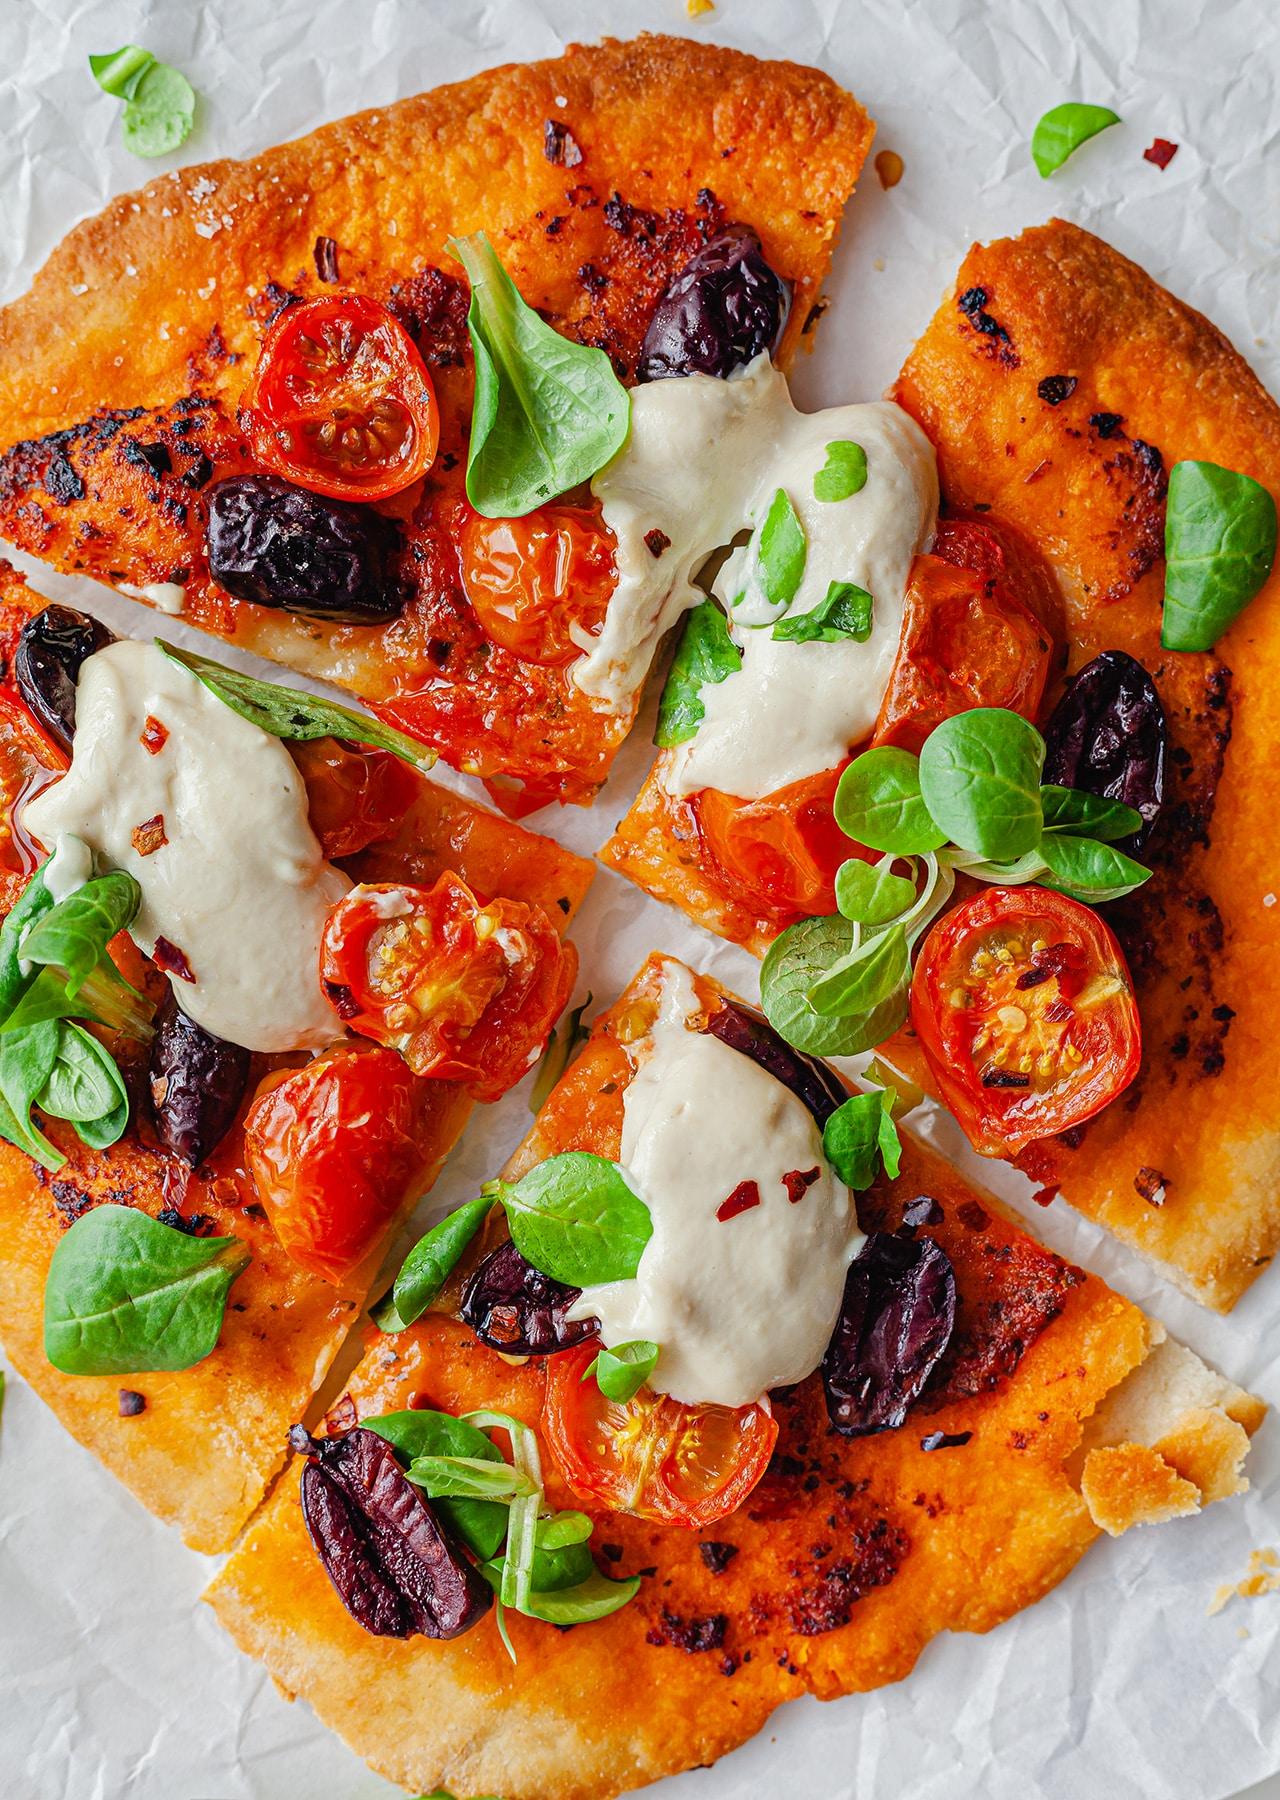 Vegan Speedy Flatbread Pesto Pizza Recipe